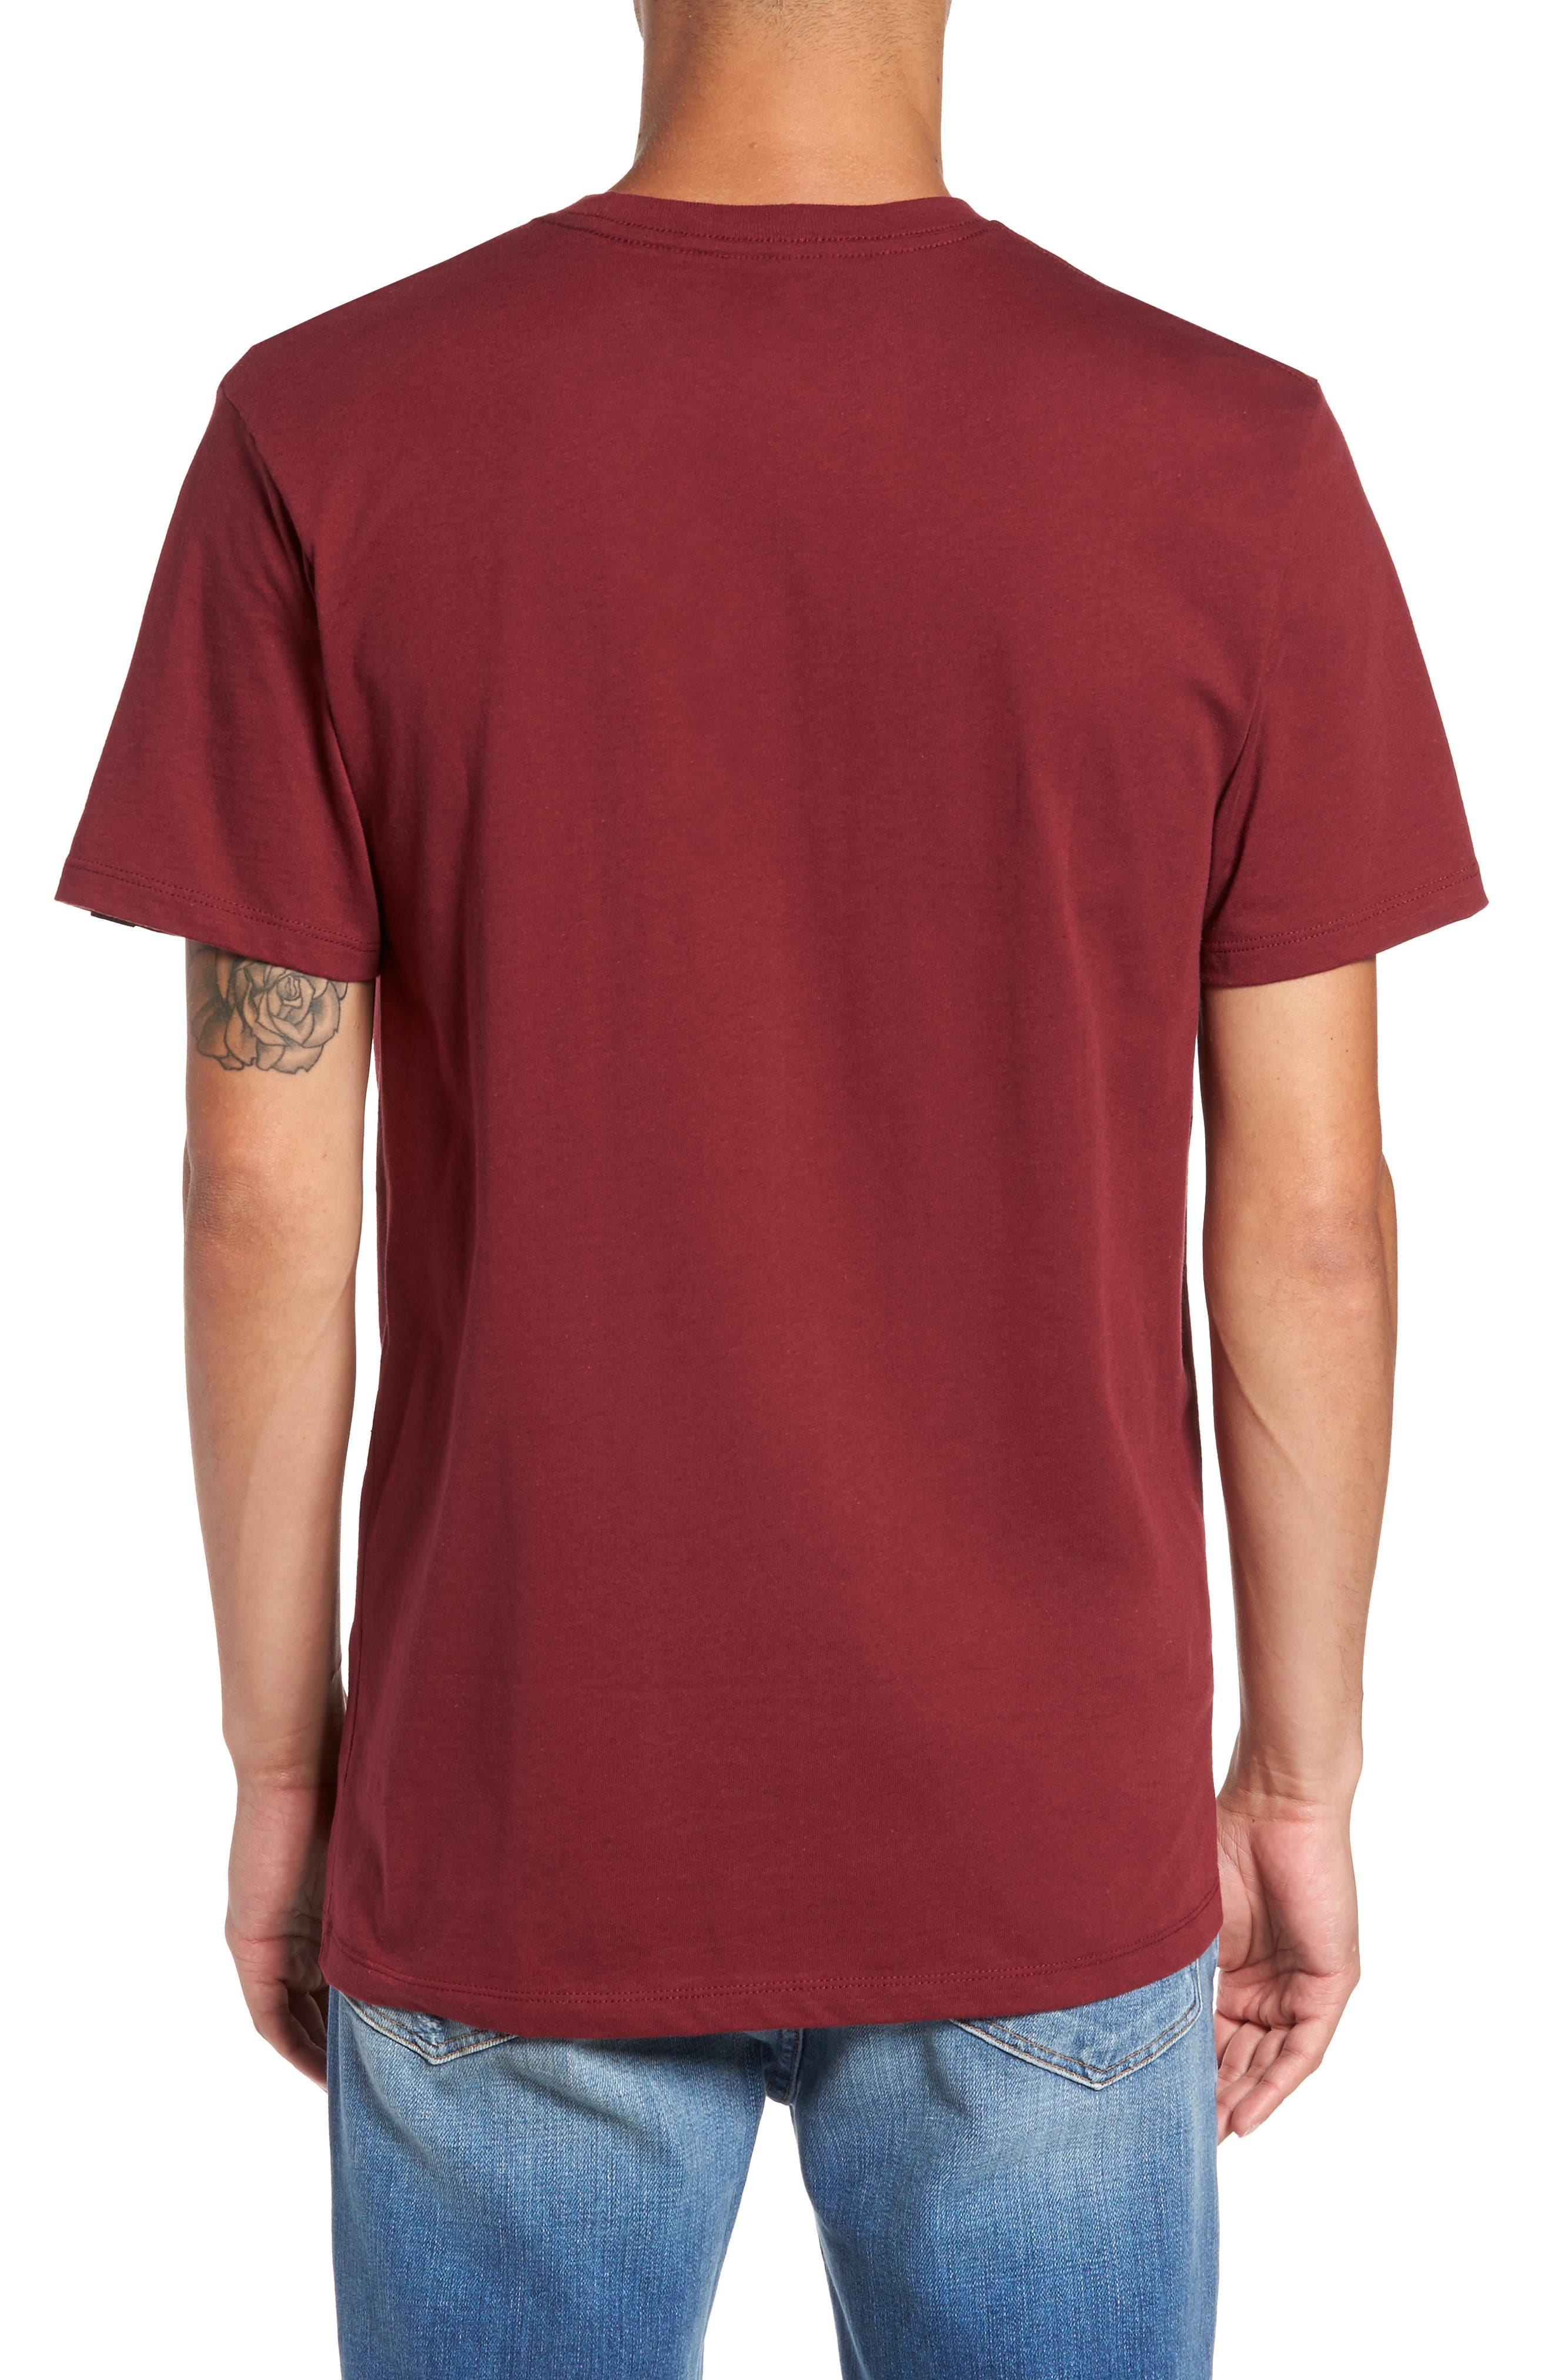 Alternate Image 2  - Vans Thunderbird Graphic Pocket T-Shirt